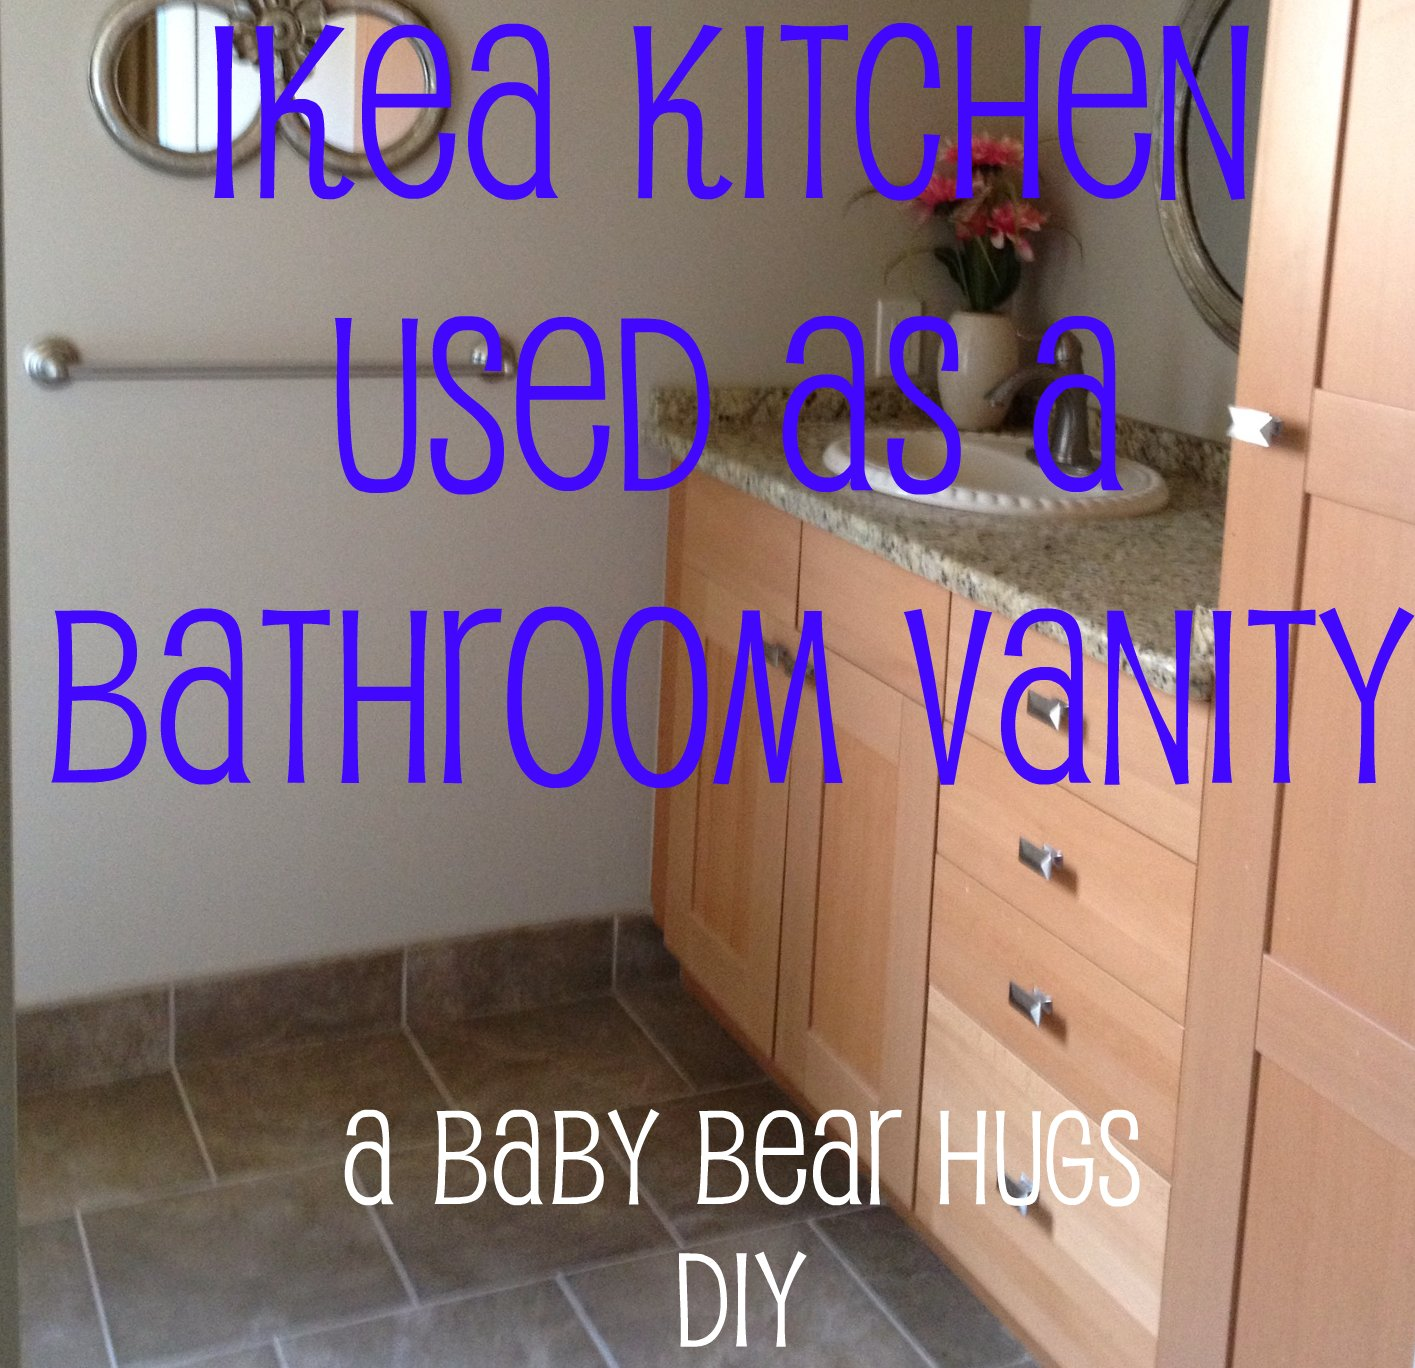 bathroom vanity ideas ikea. image of best bathroom vanity ideas